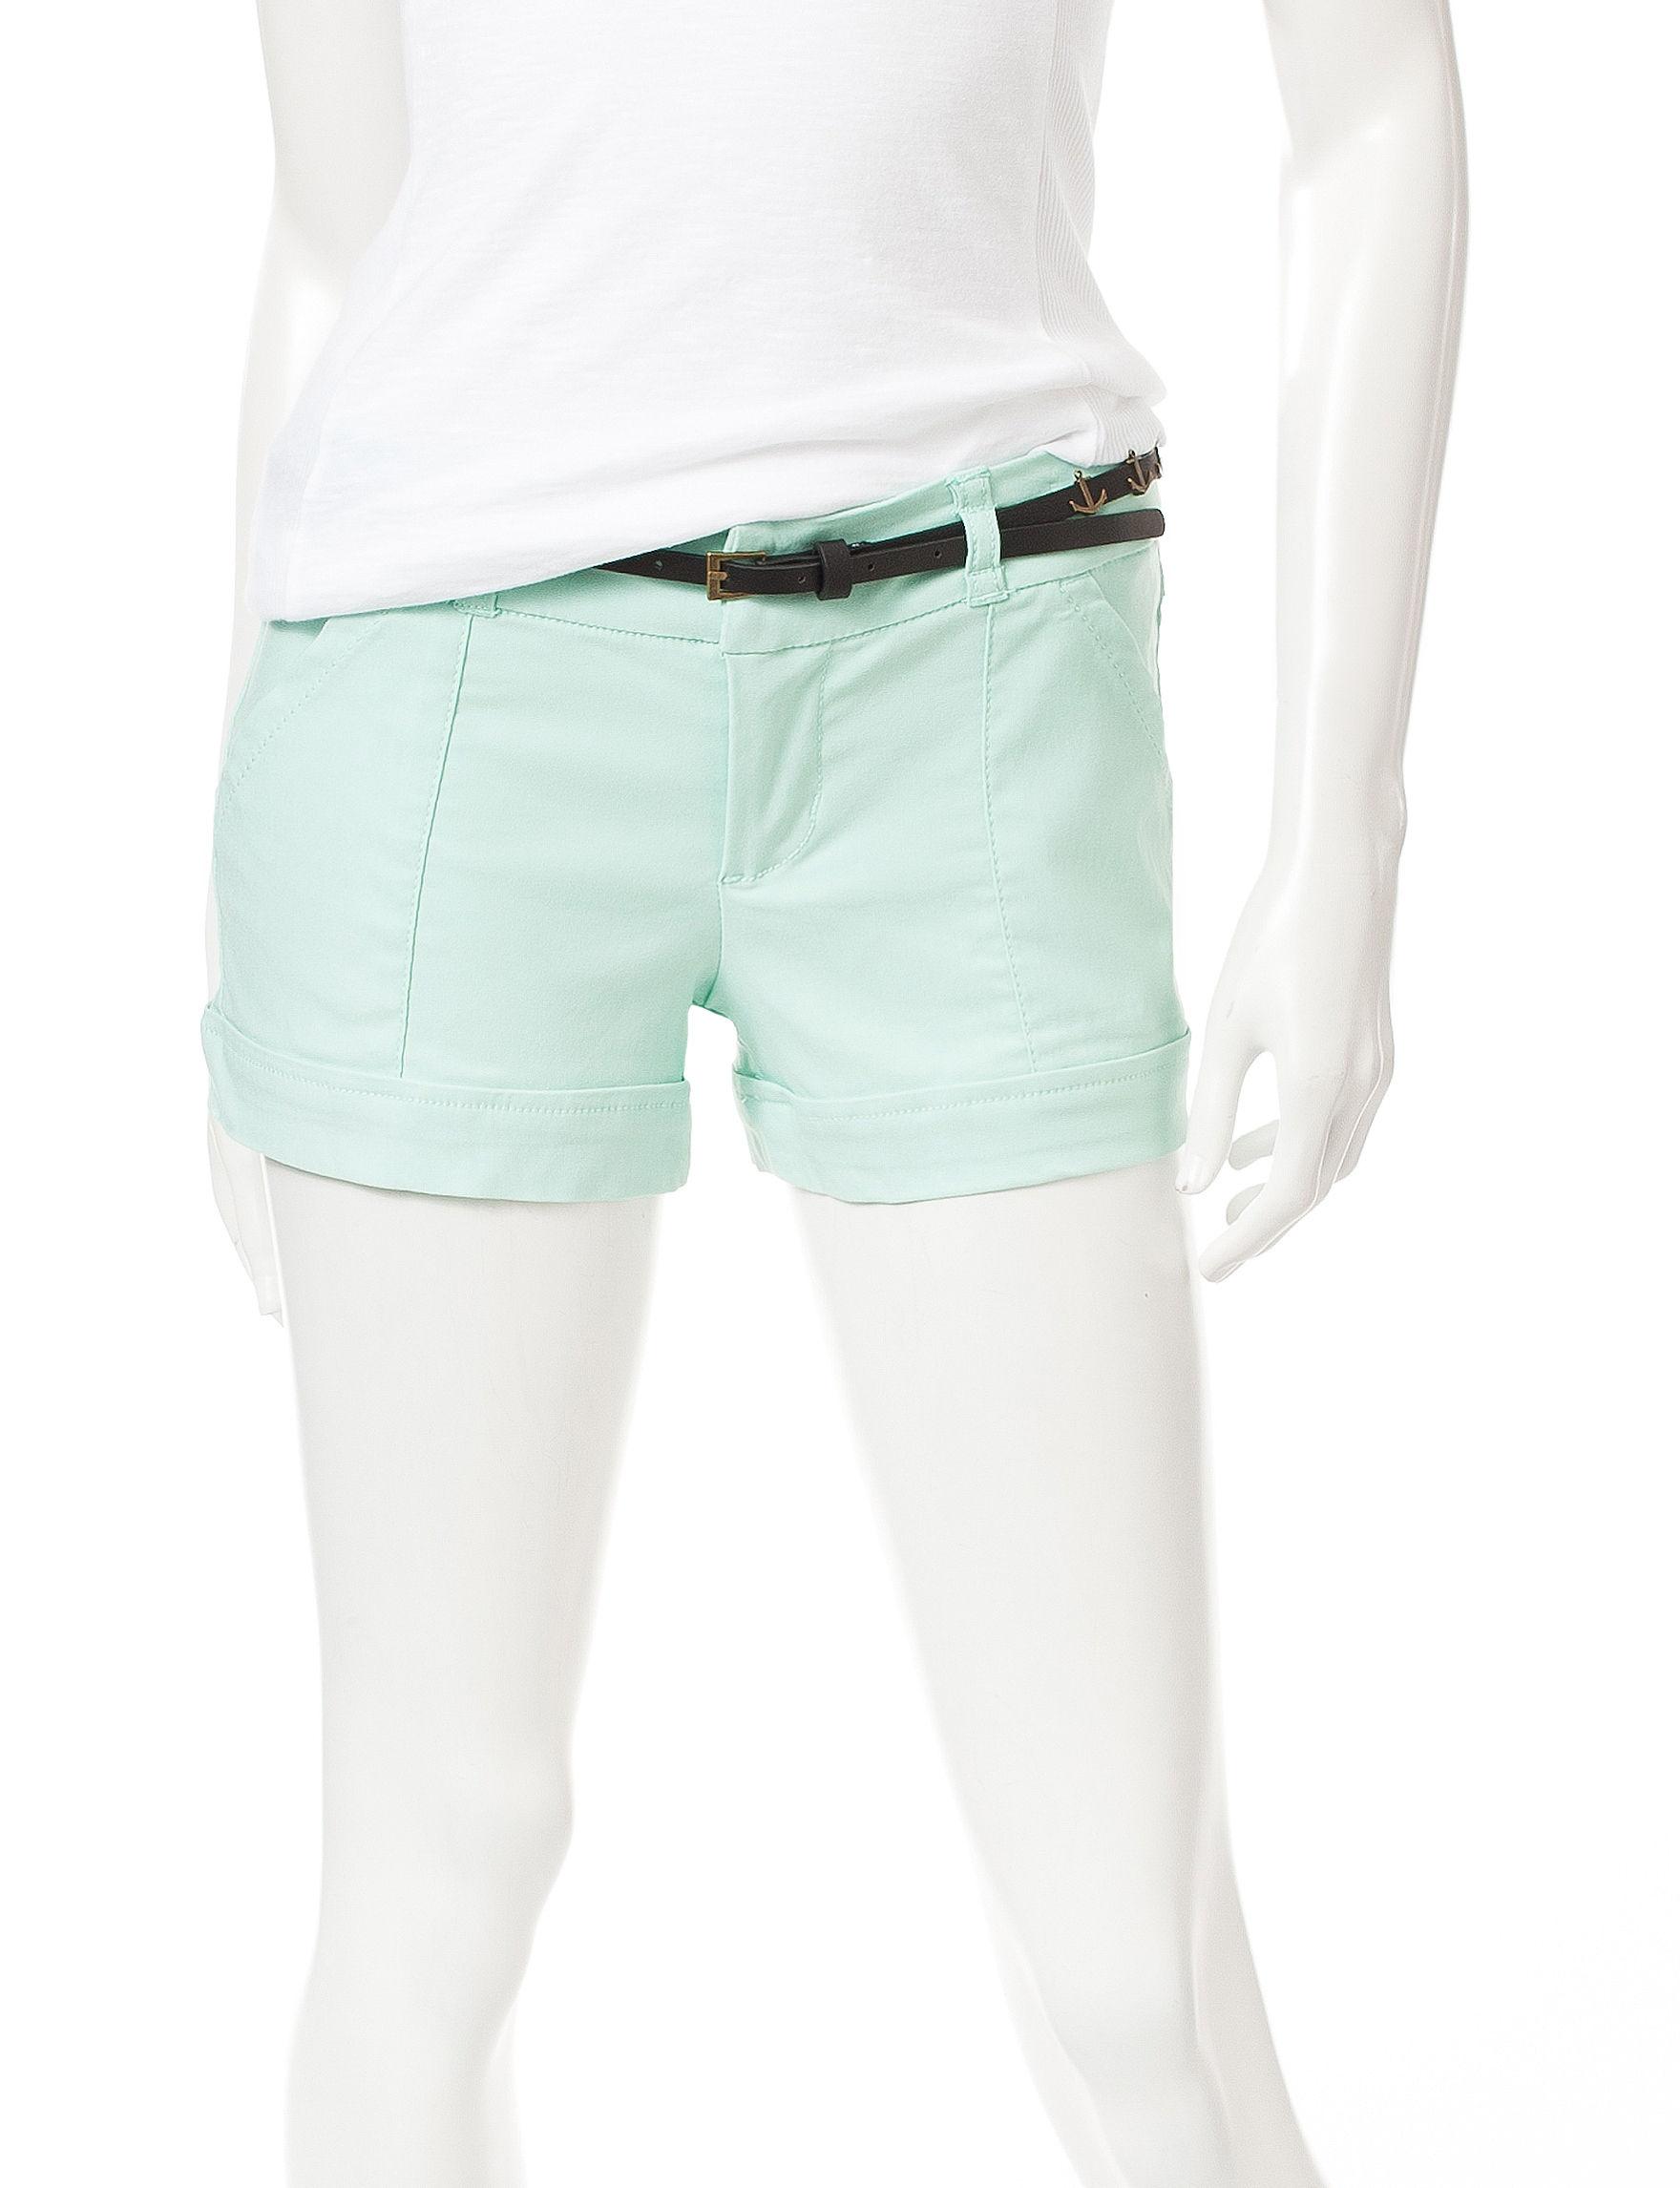 BeBop Aquamarine Tailored Shorts